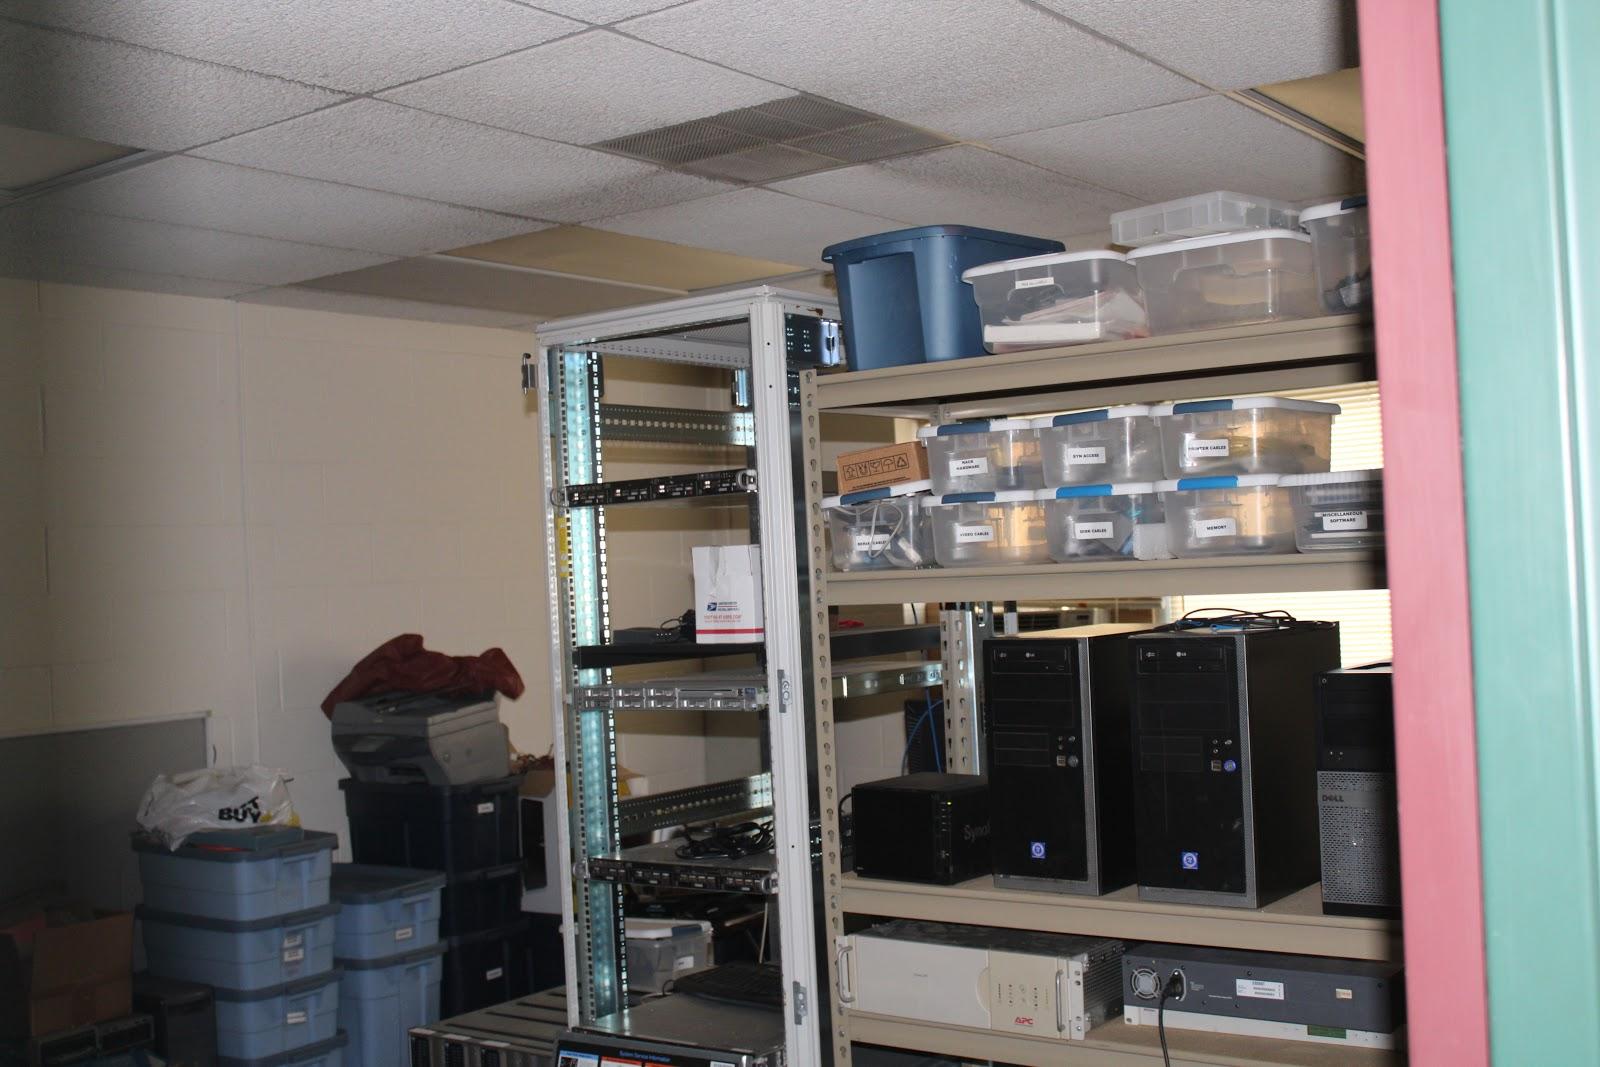 Incubator IT shelving space